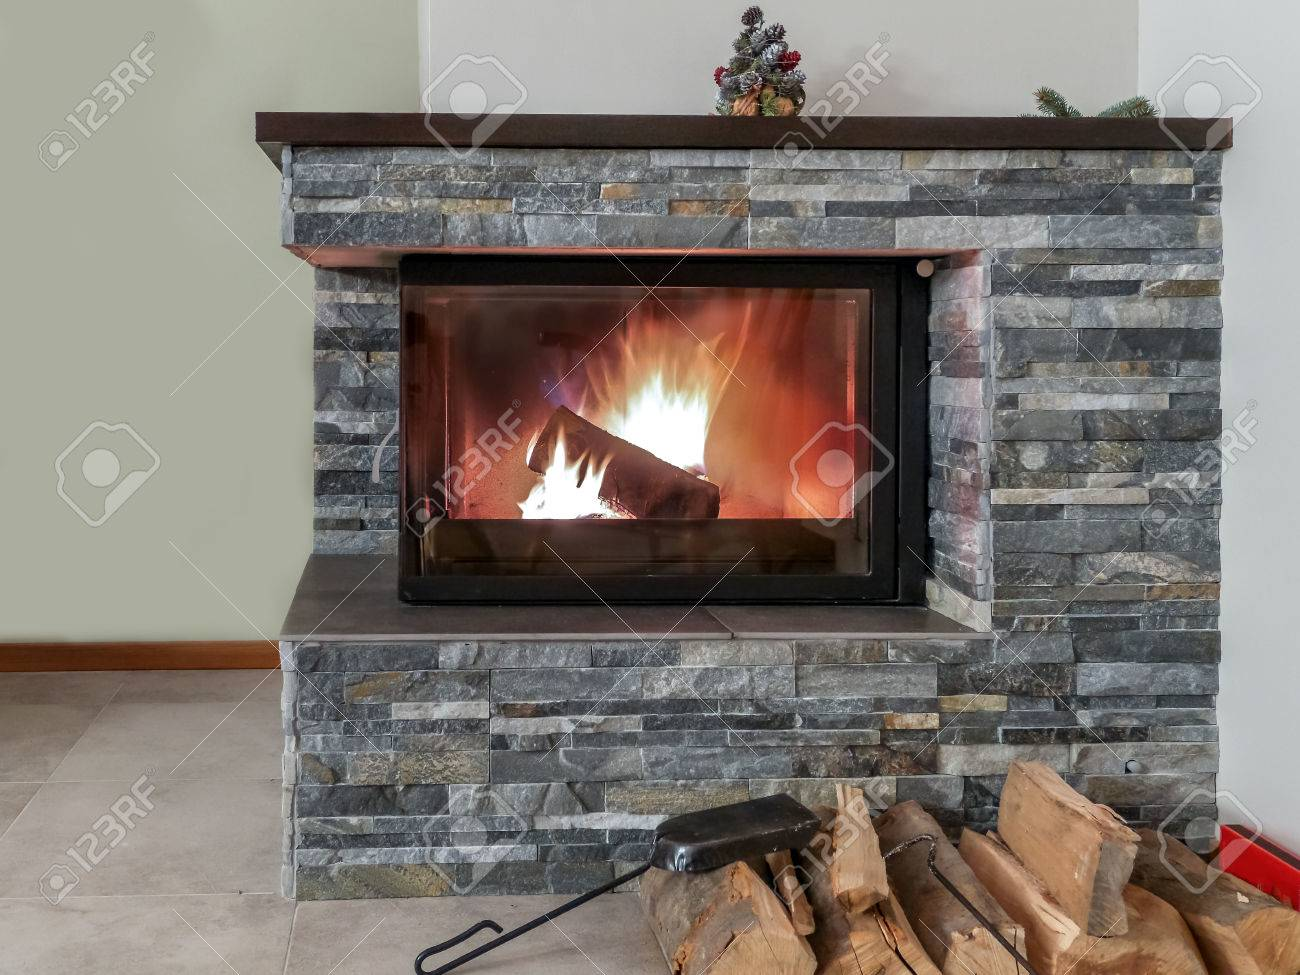 chimenea de piedra con lea encendida foto de archivo